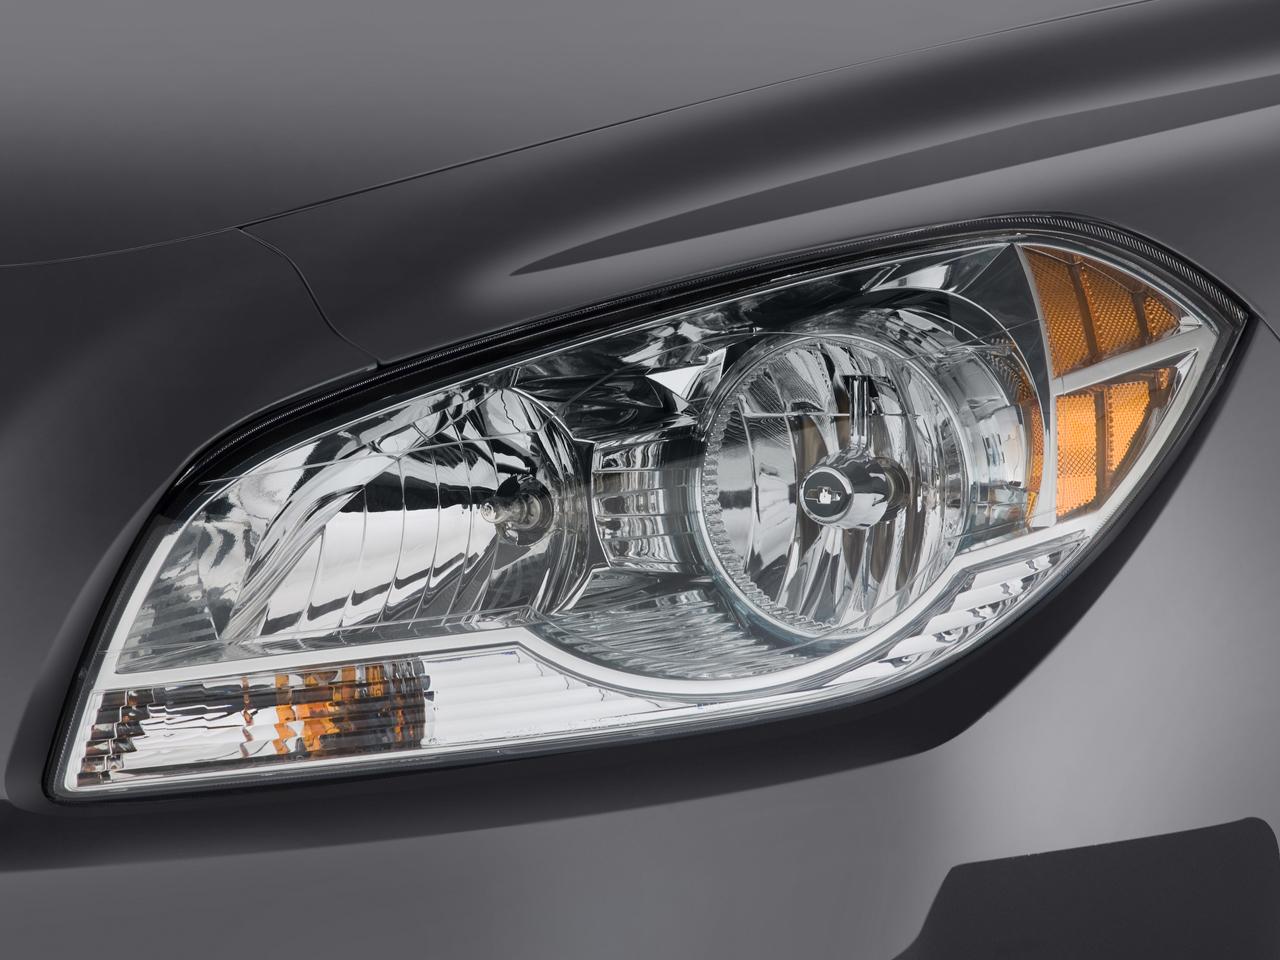 2008 Chevrolet Malibu Hybrid - Latest News, Reviews, and Auto Show ...